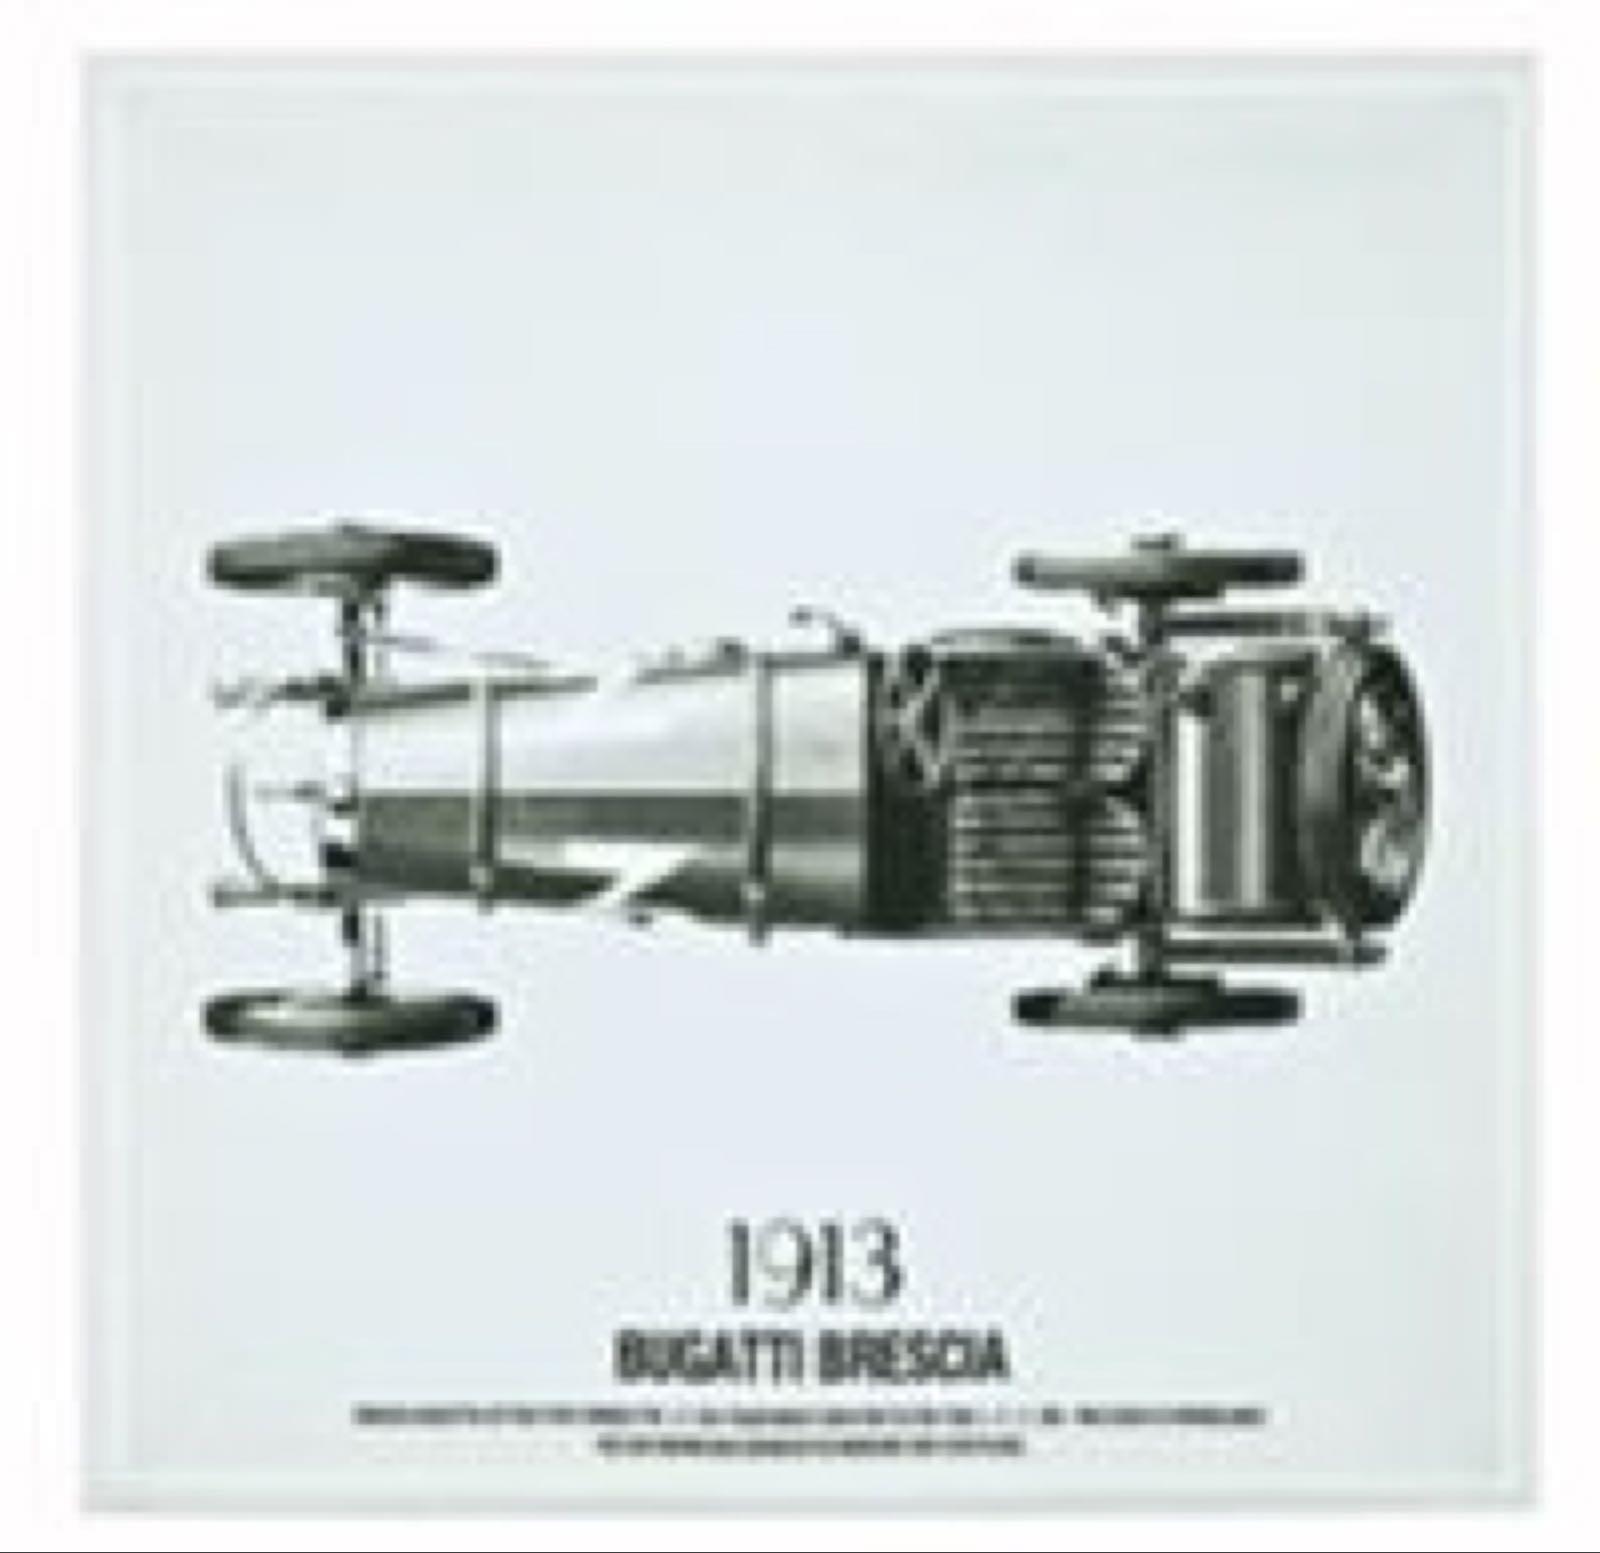 Bilde: Bugatti 3, ovenfra